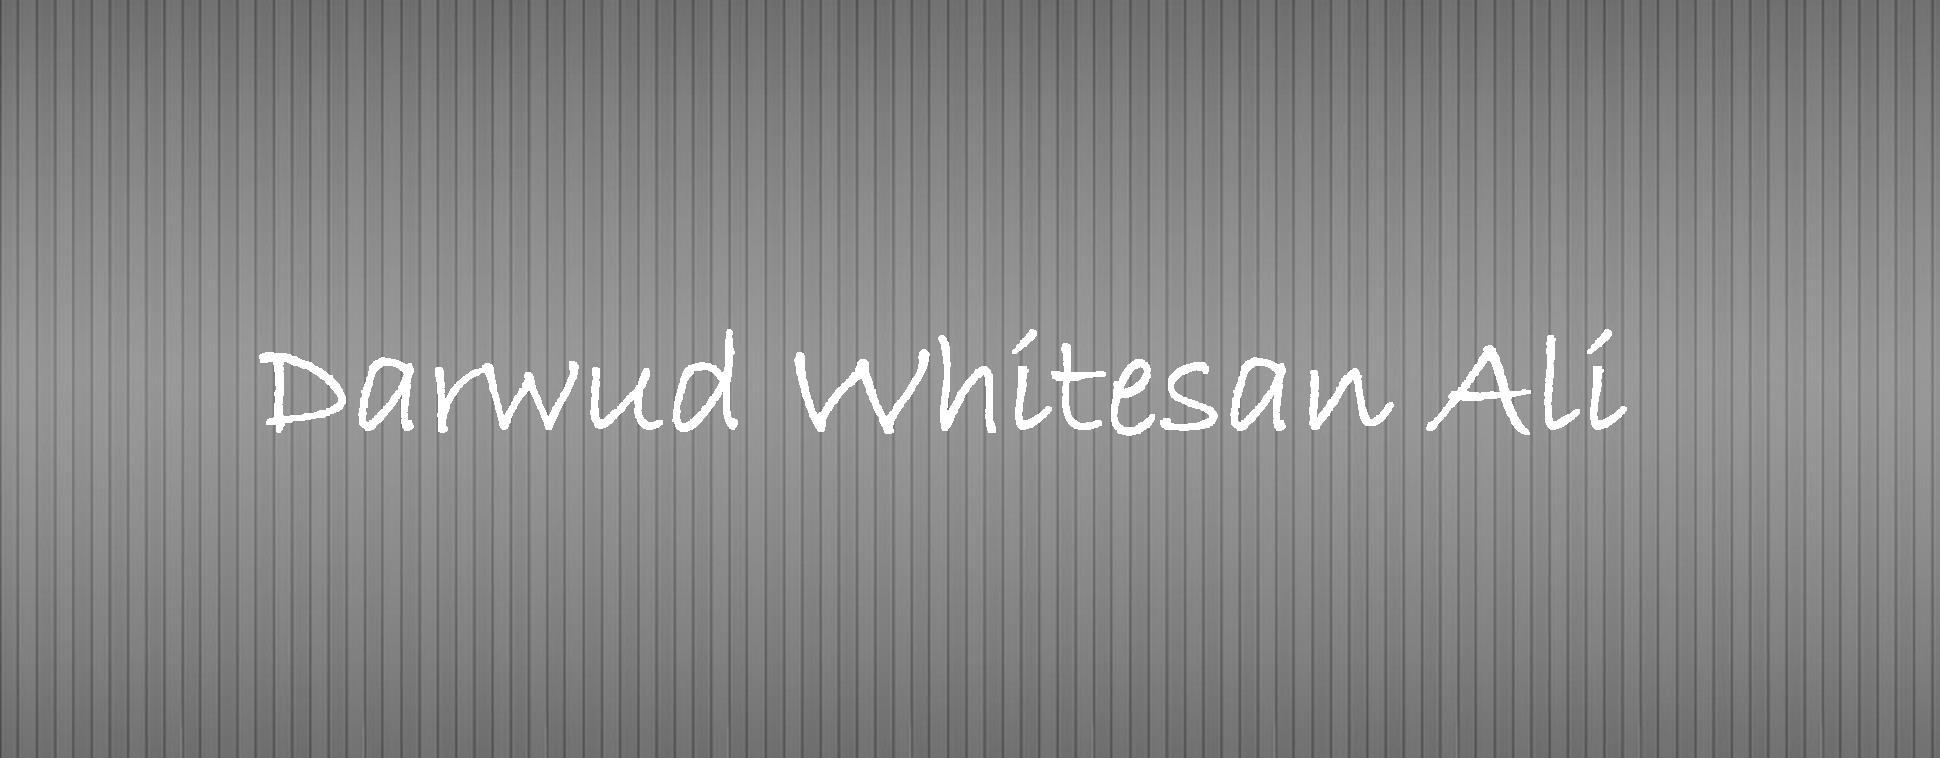 Darwud Whitesan Ali.jpg